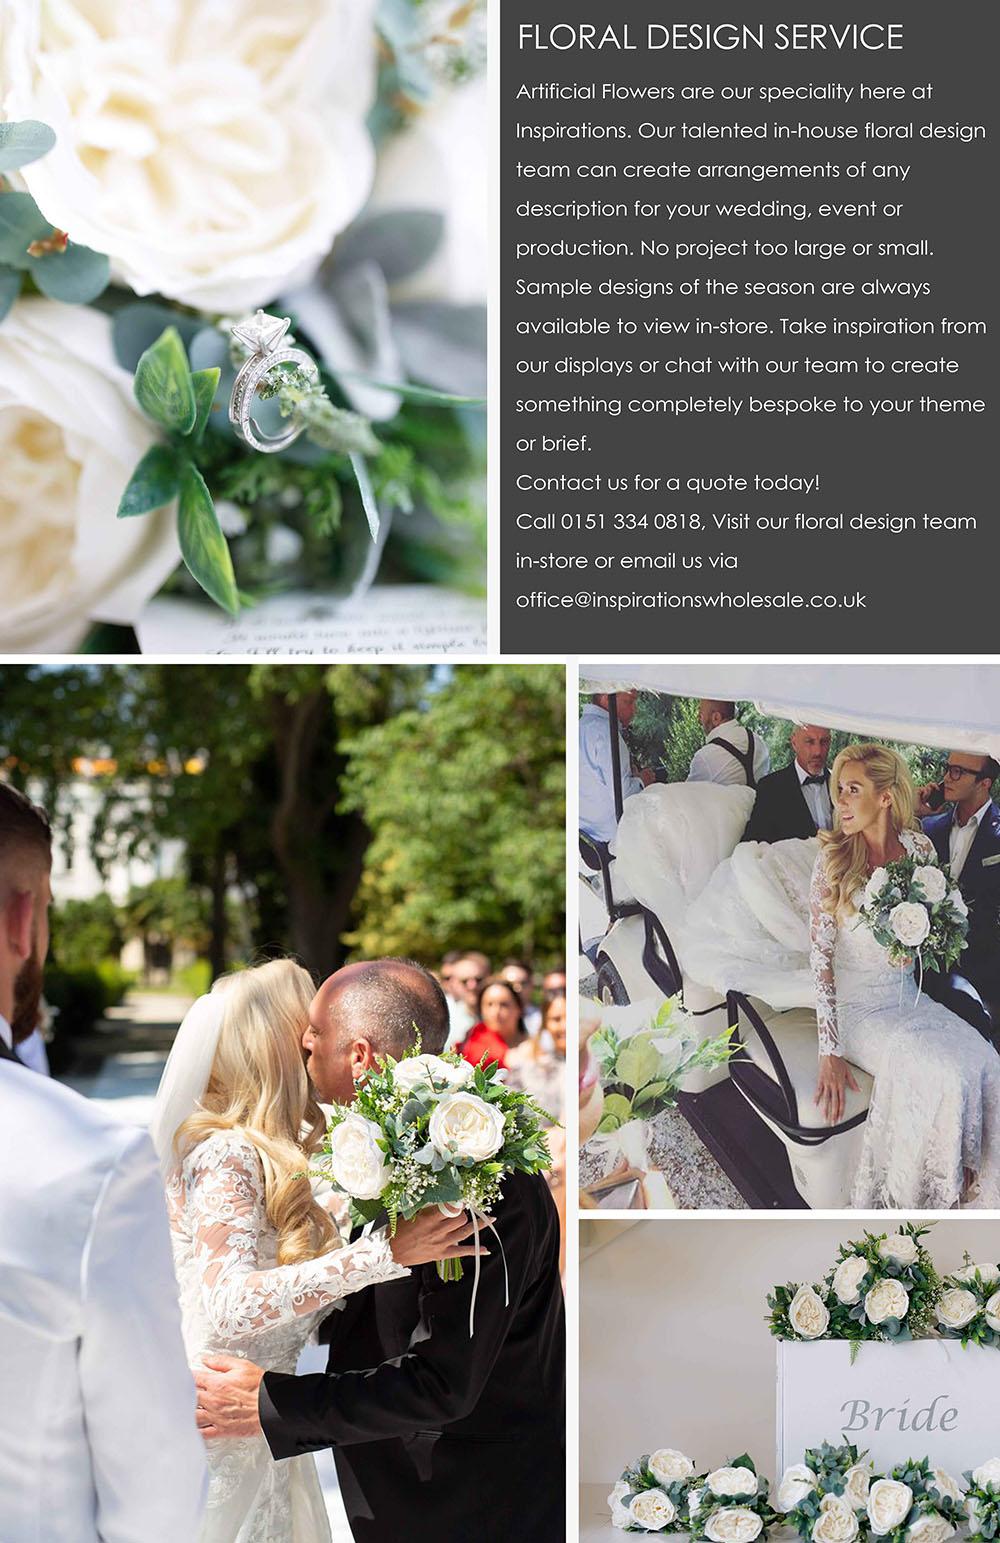 Artificial Flower Arrangements For Weddings Inspirations Wholesale